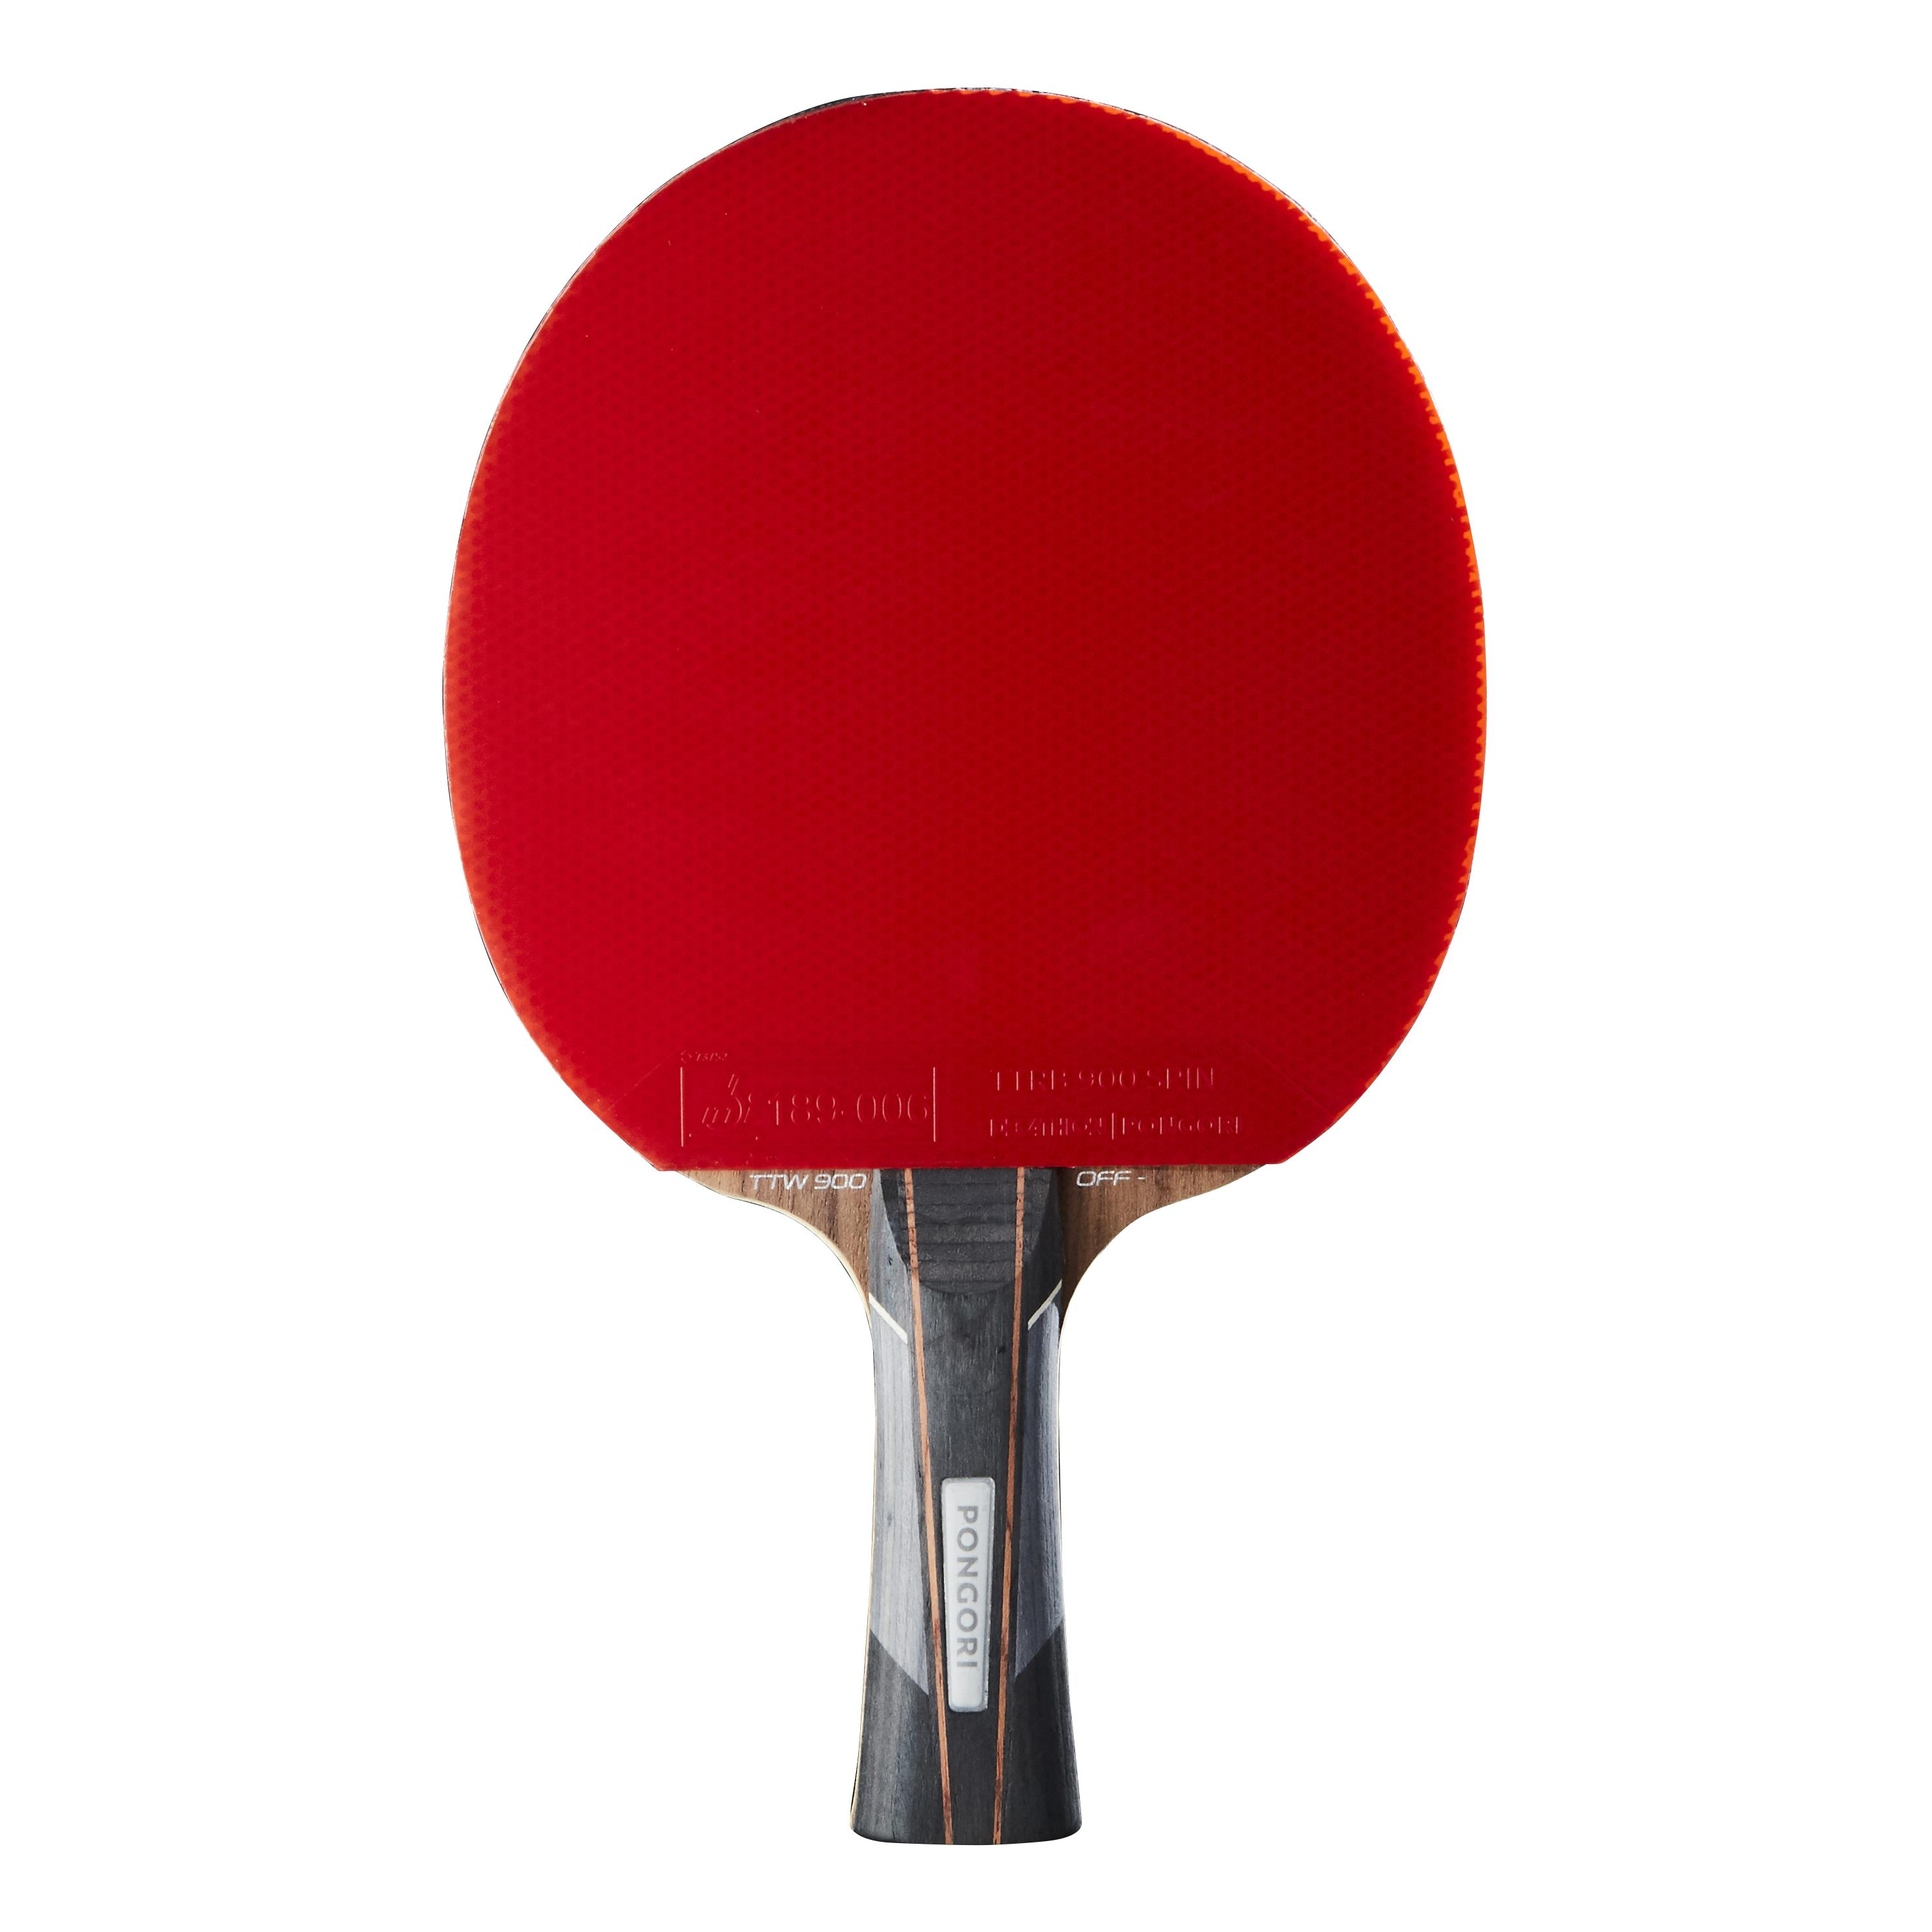 Paletă Tenis TTR900 SPIN imagine